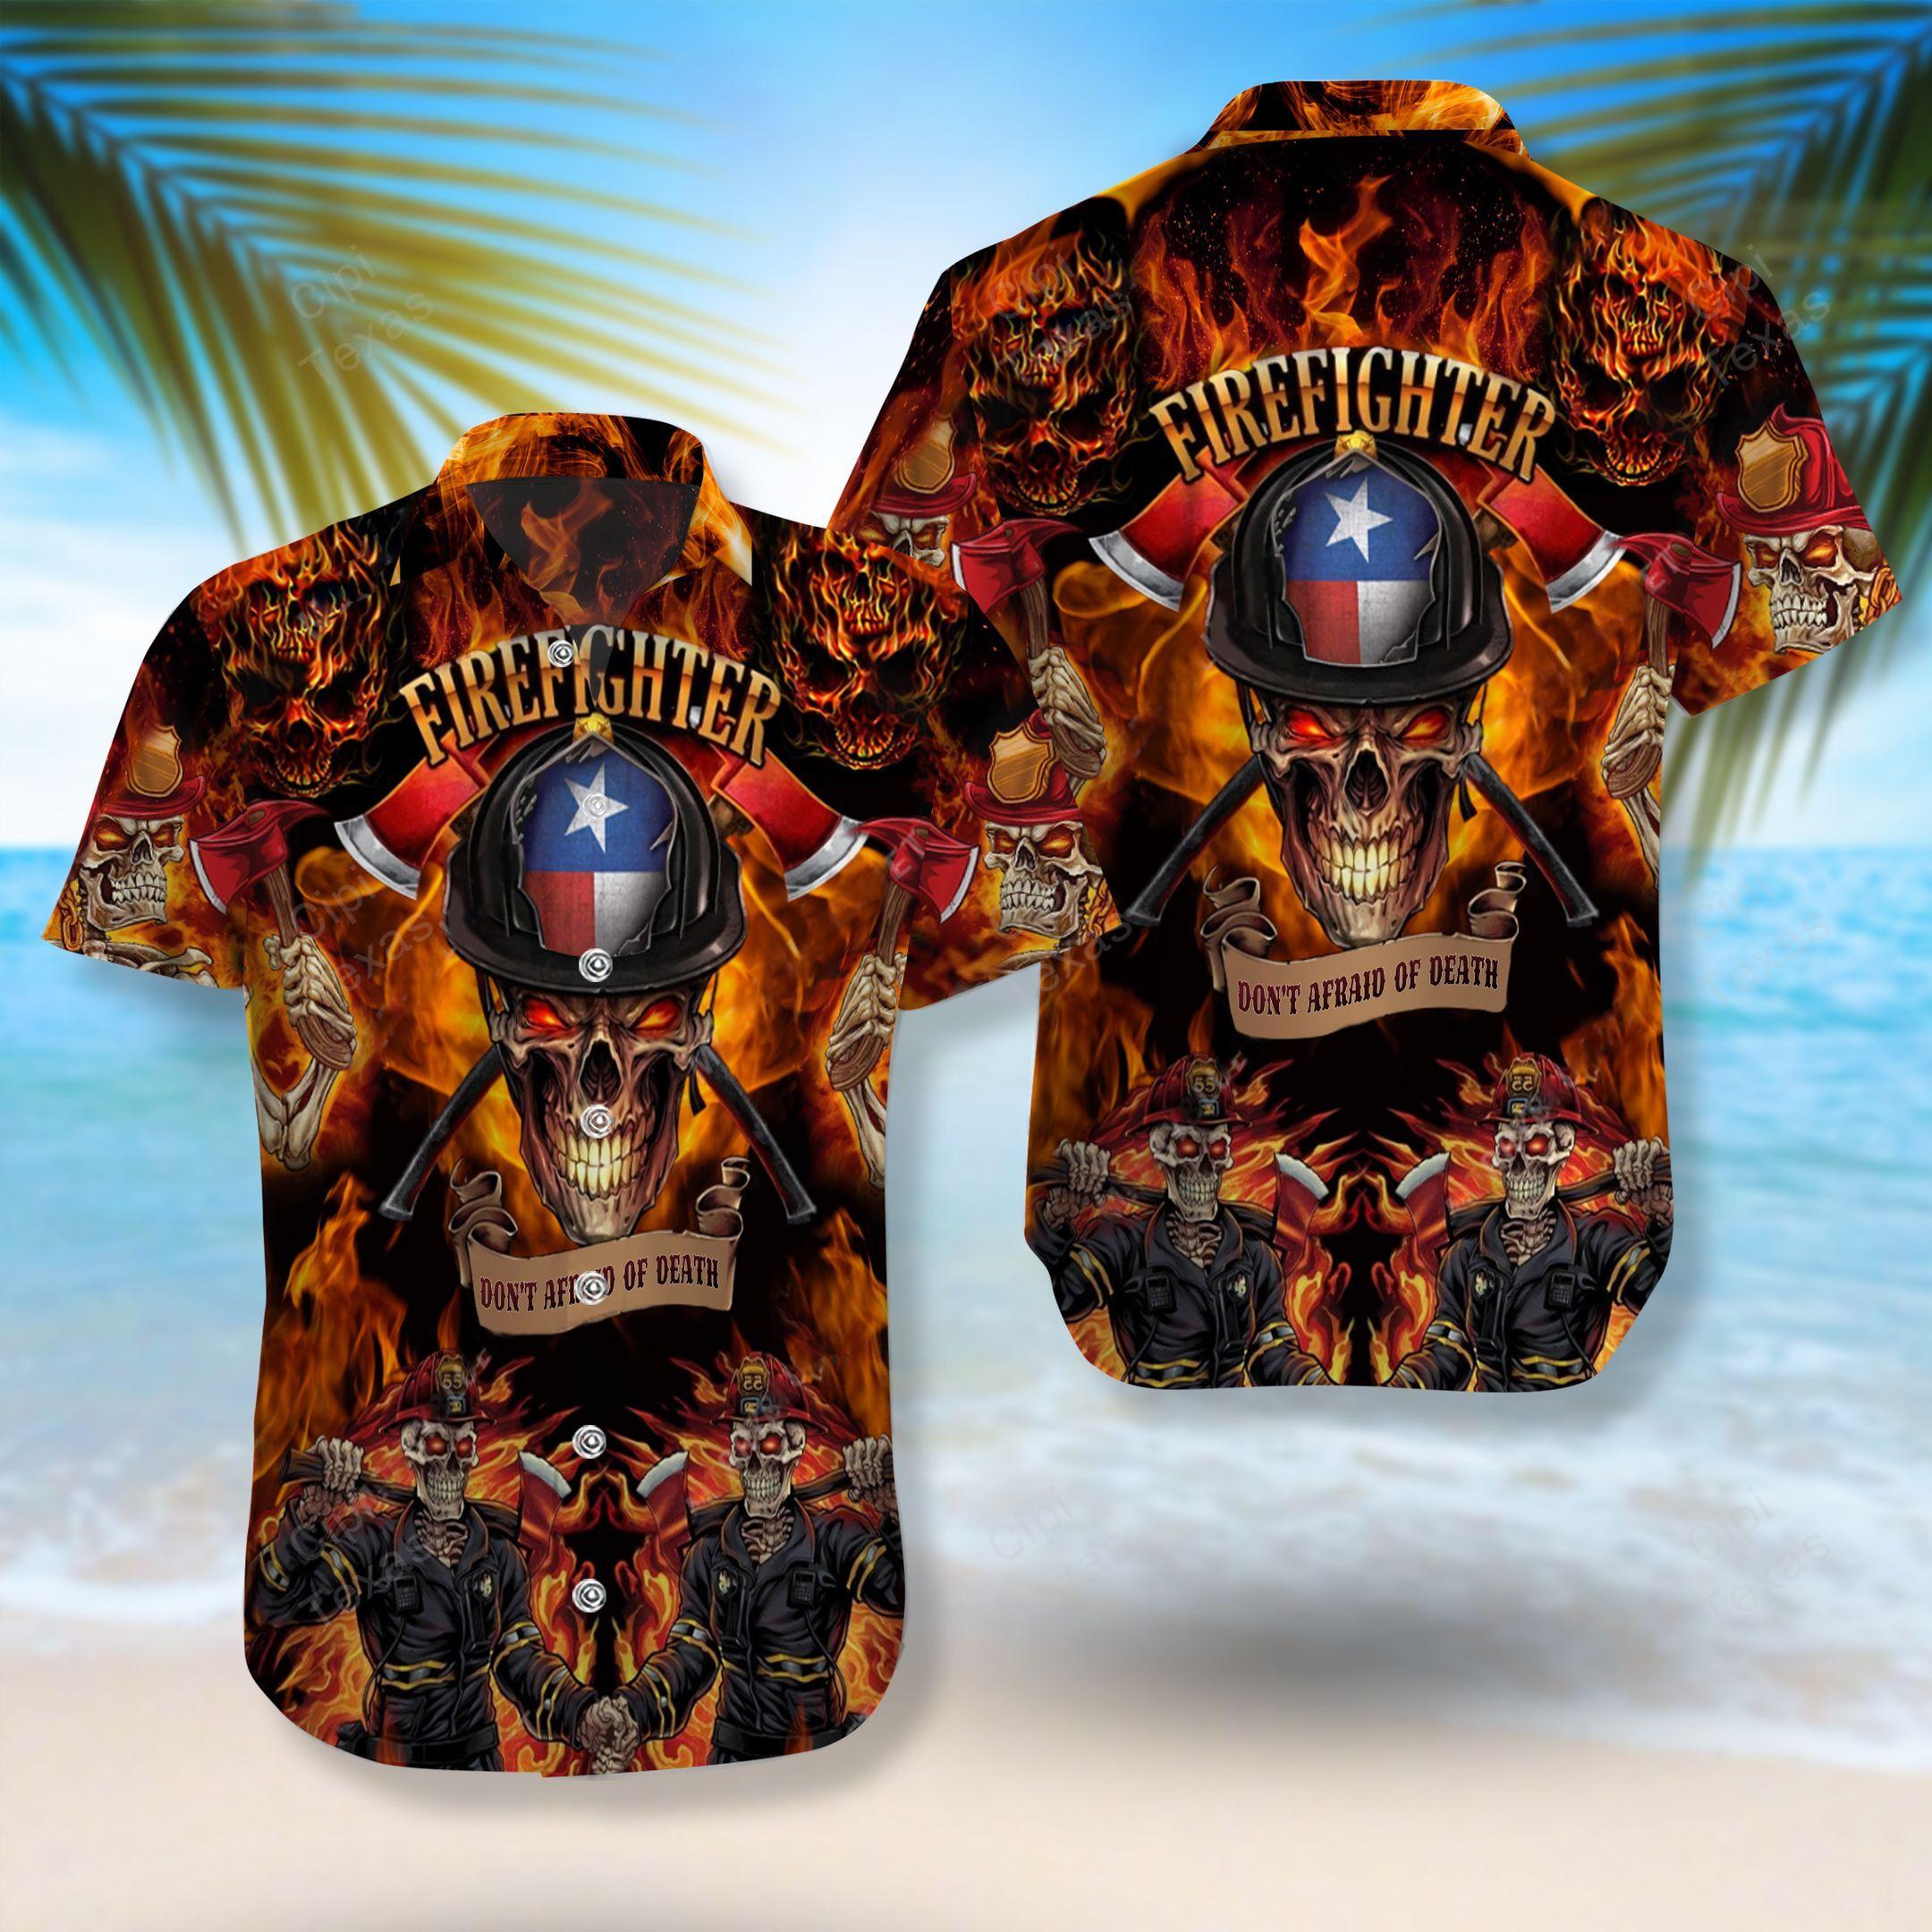 Firefighter Don't Afraid Of Death In Texas Hawaiian Shirt